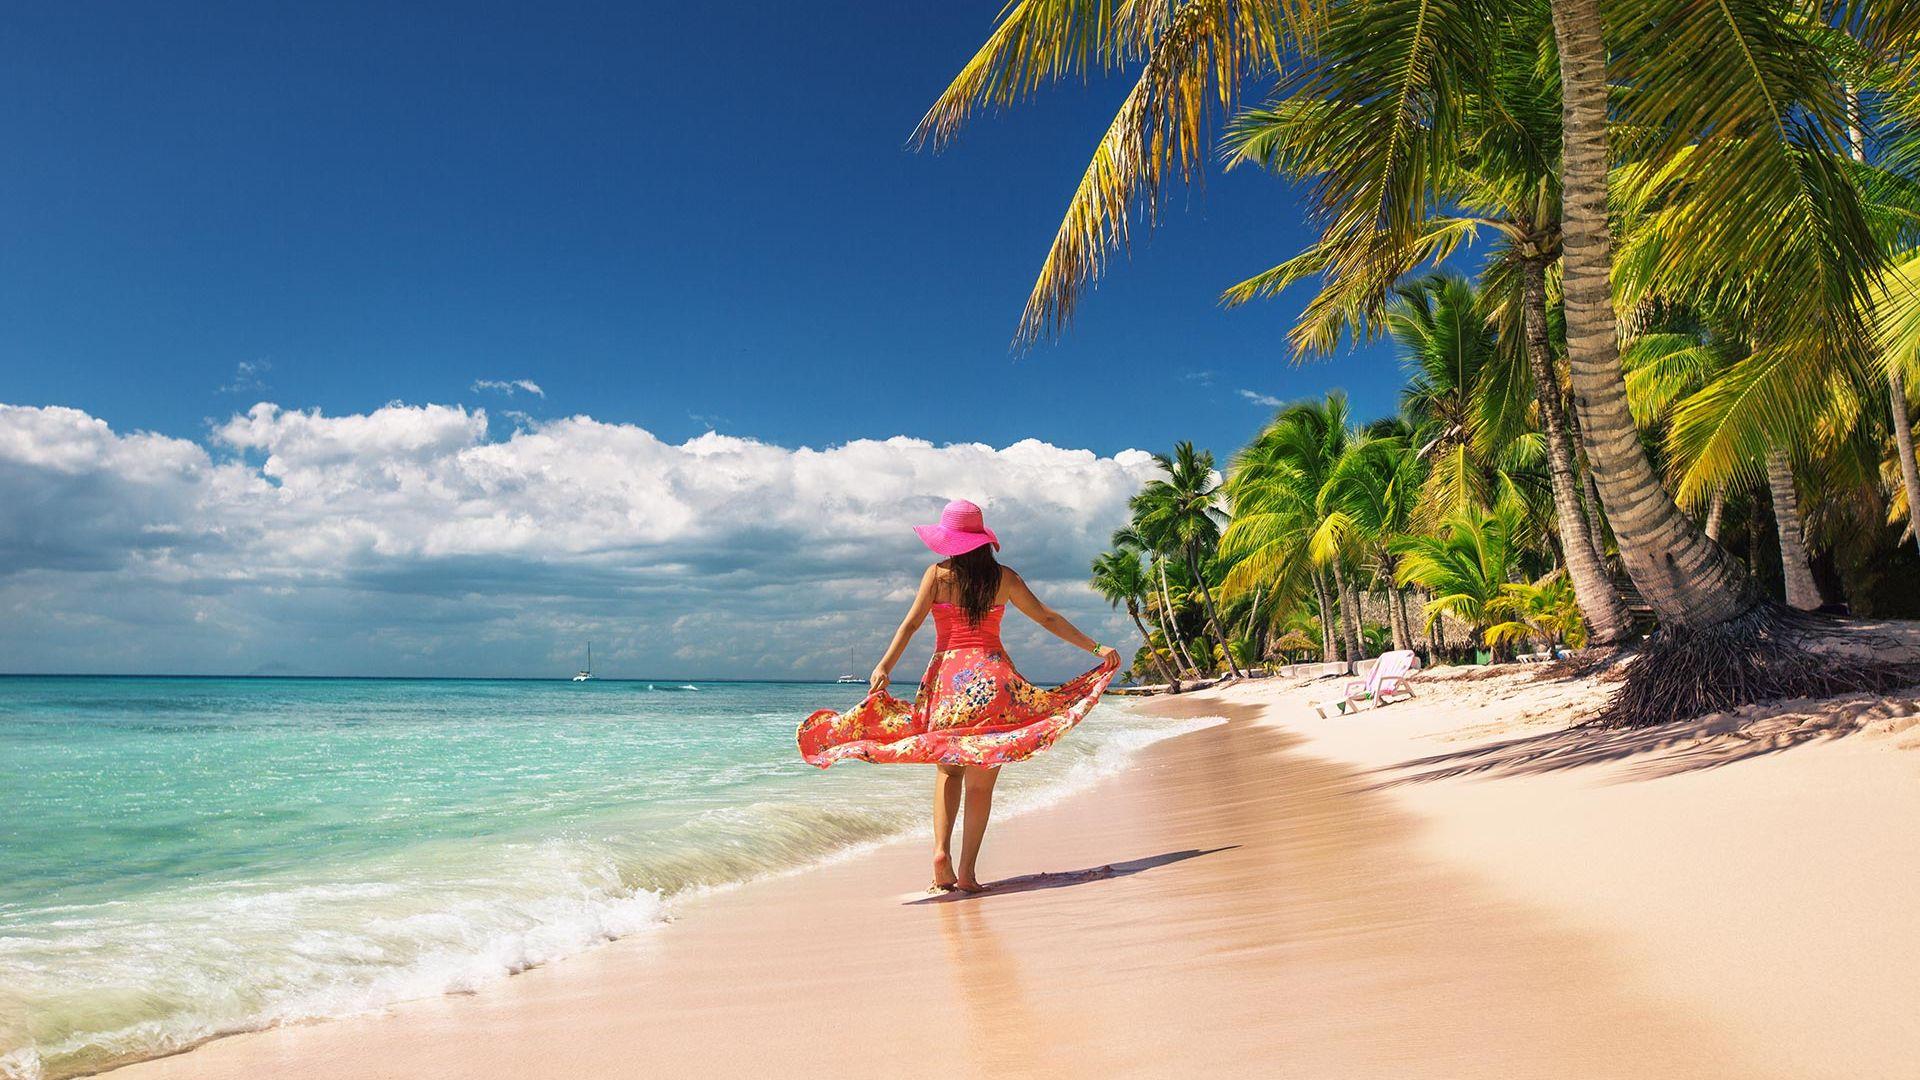 Sejur plaja Majestic Resorts Punta Cana, 9 zile - 22 august 2021